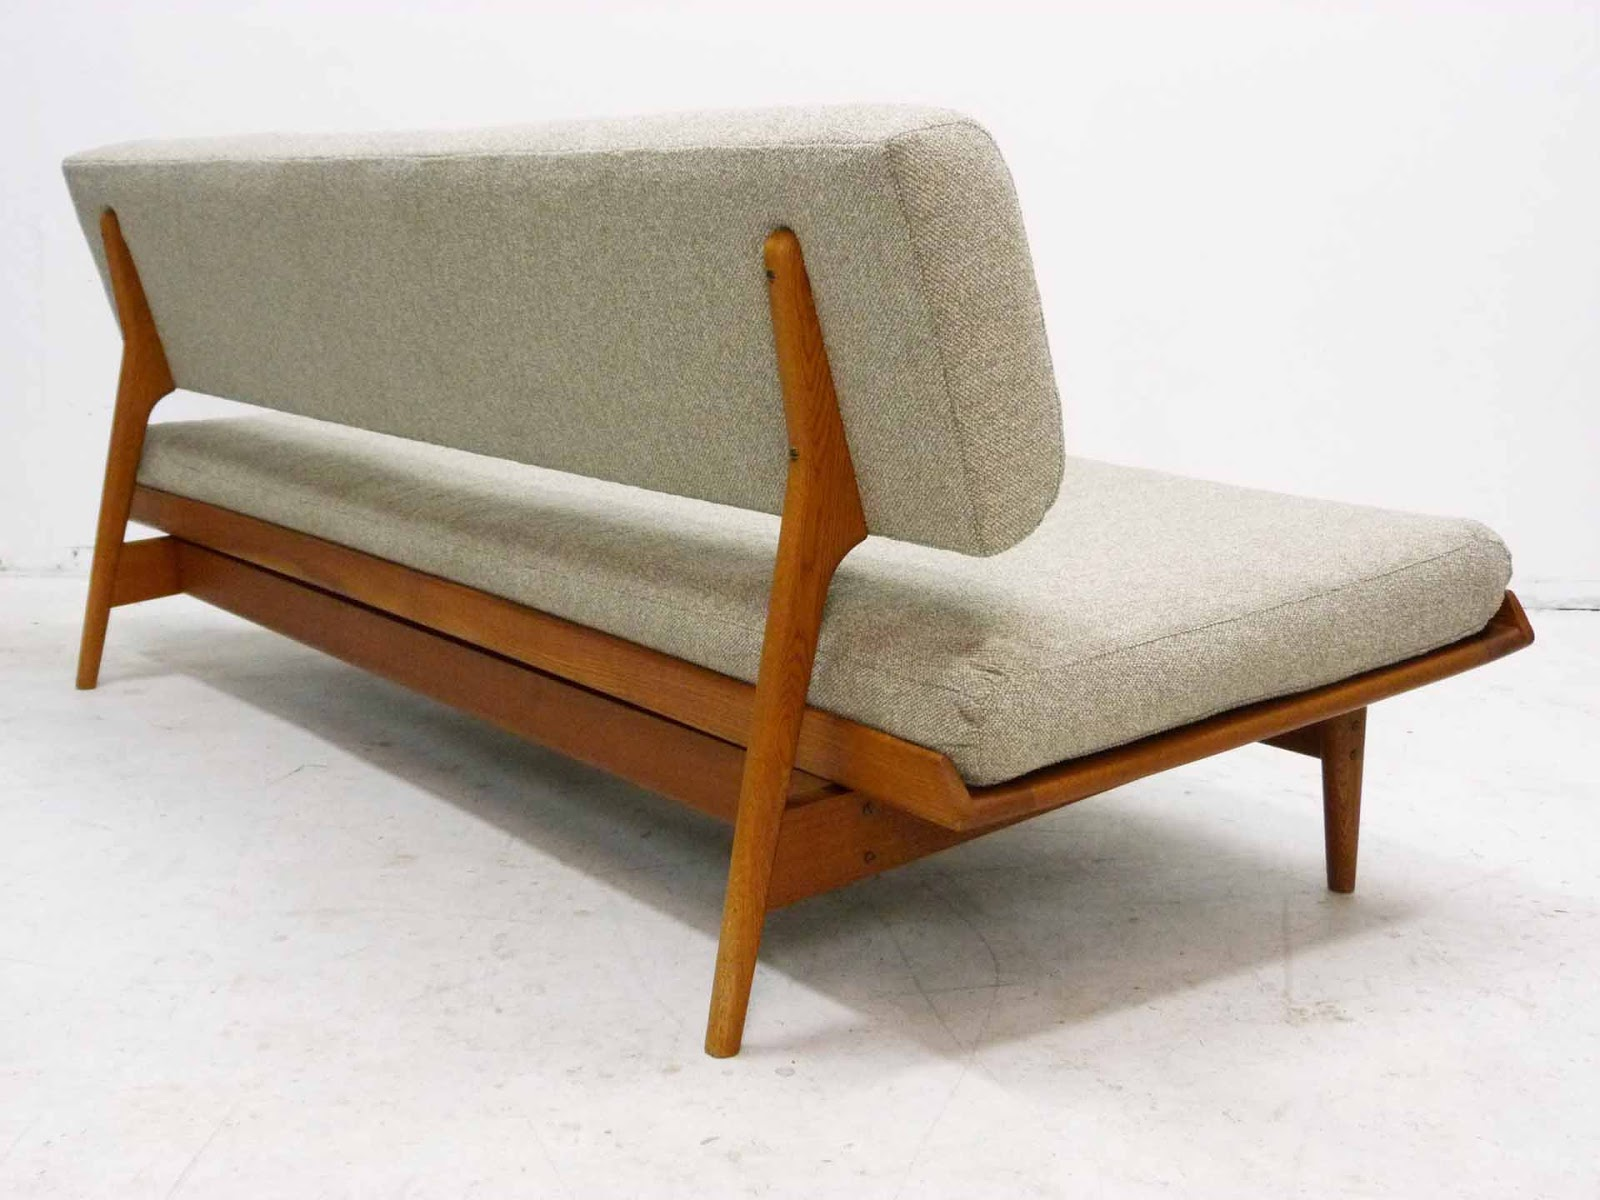 Swedish sofa swedish monte carlo sofa in oak and brown for Swedish sofa